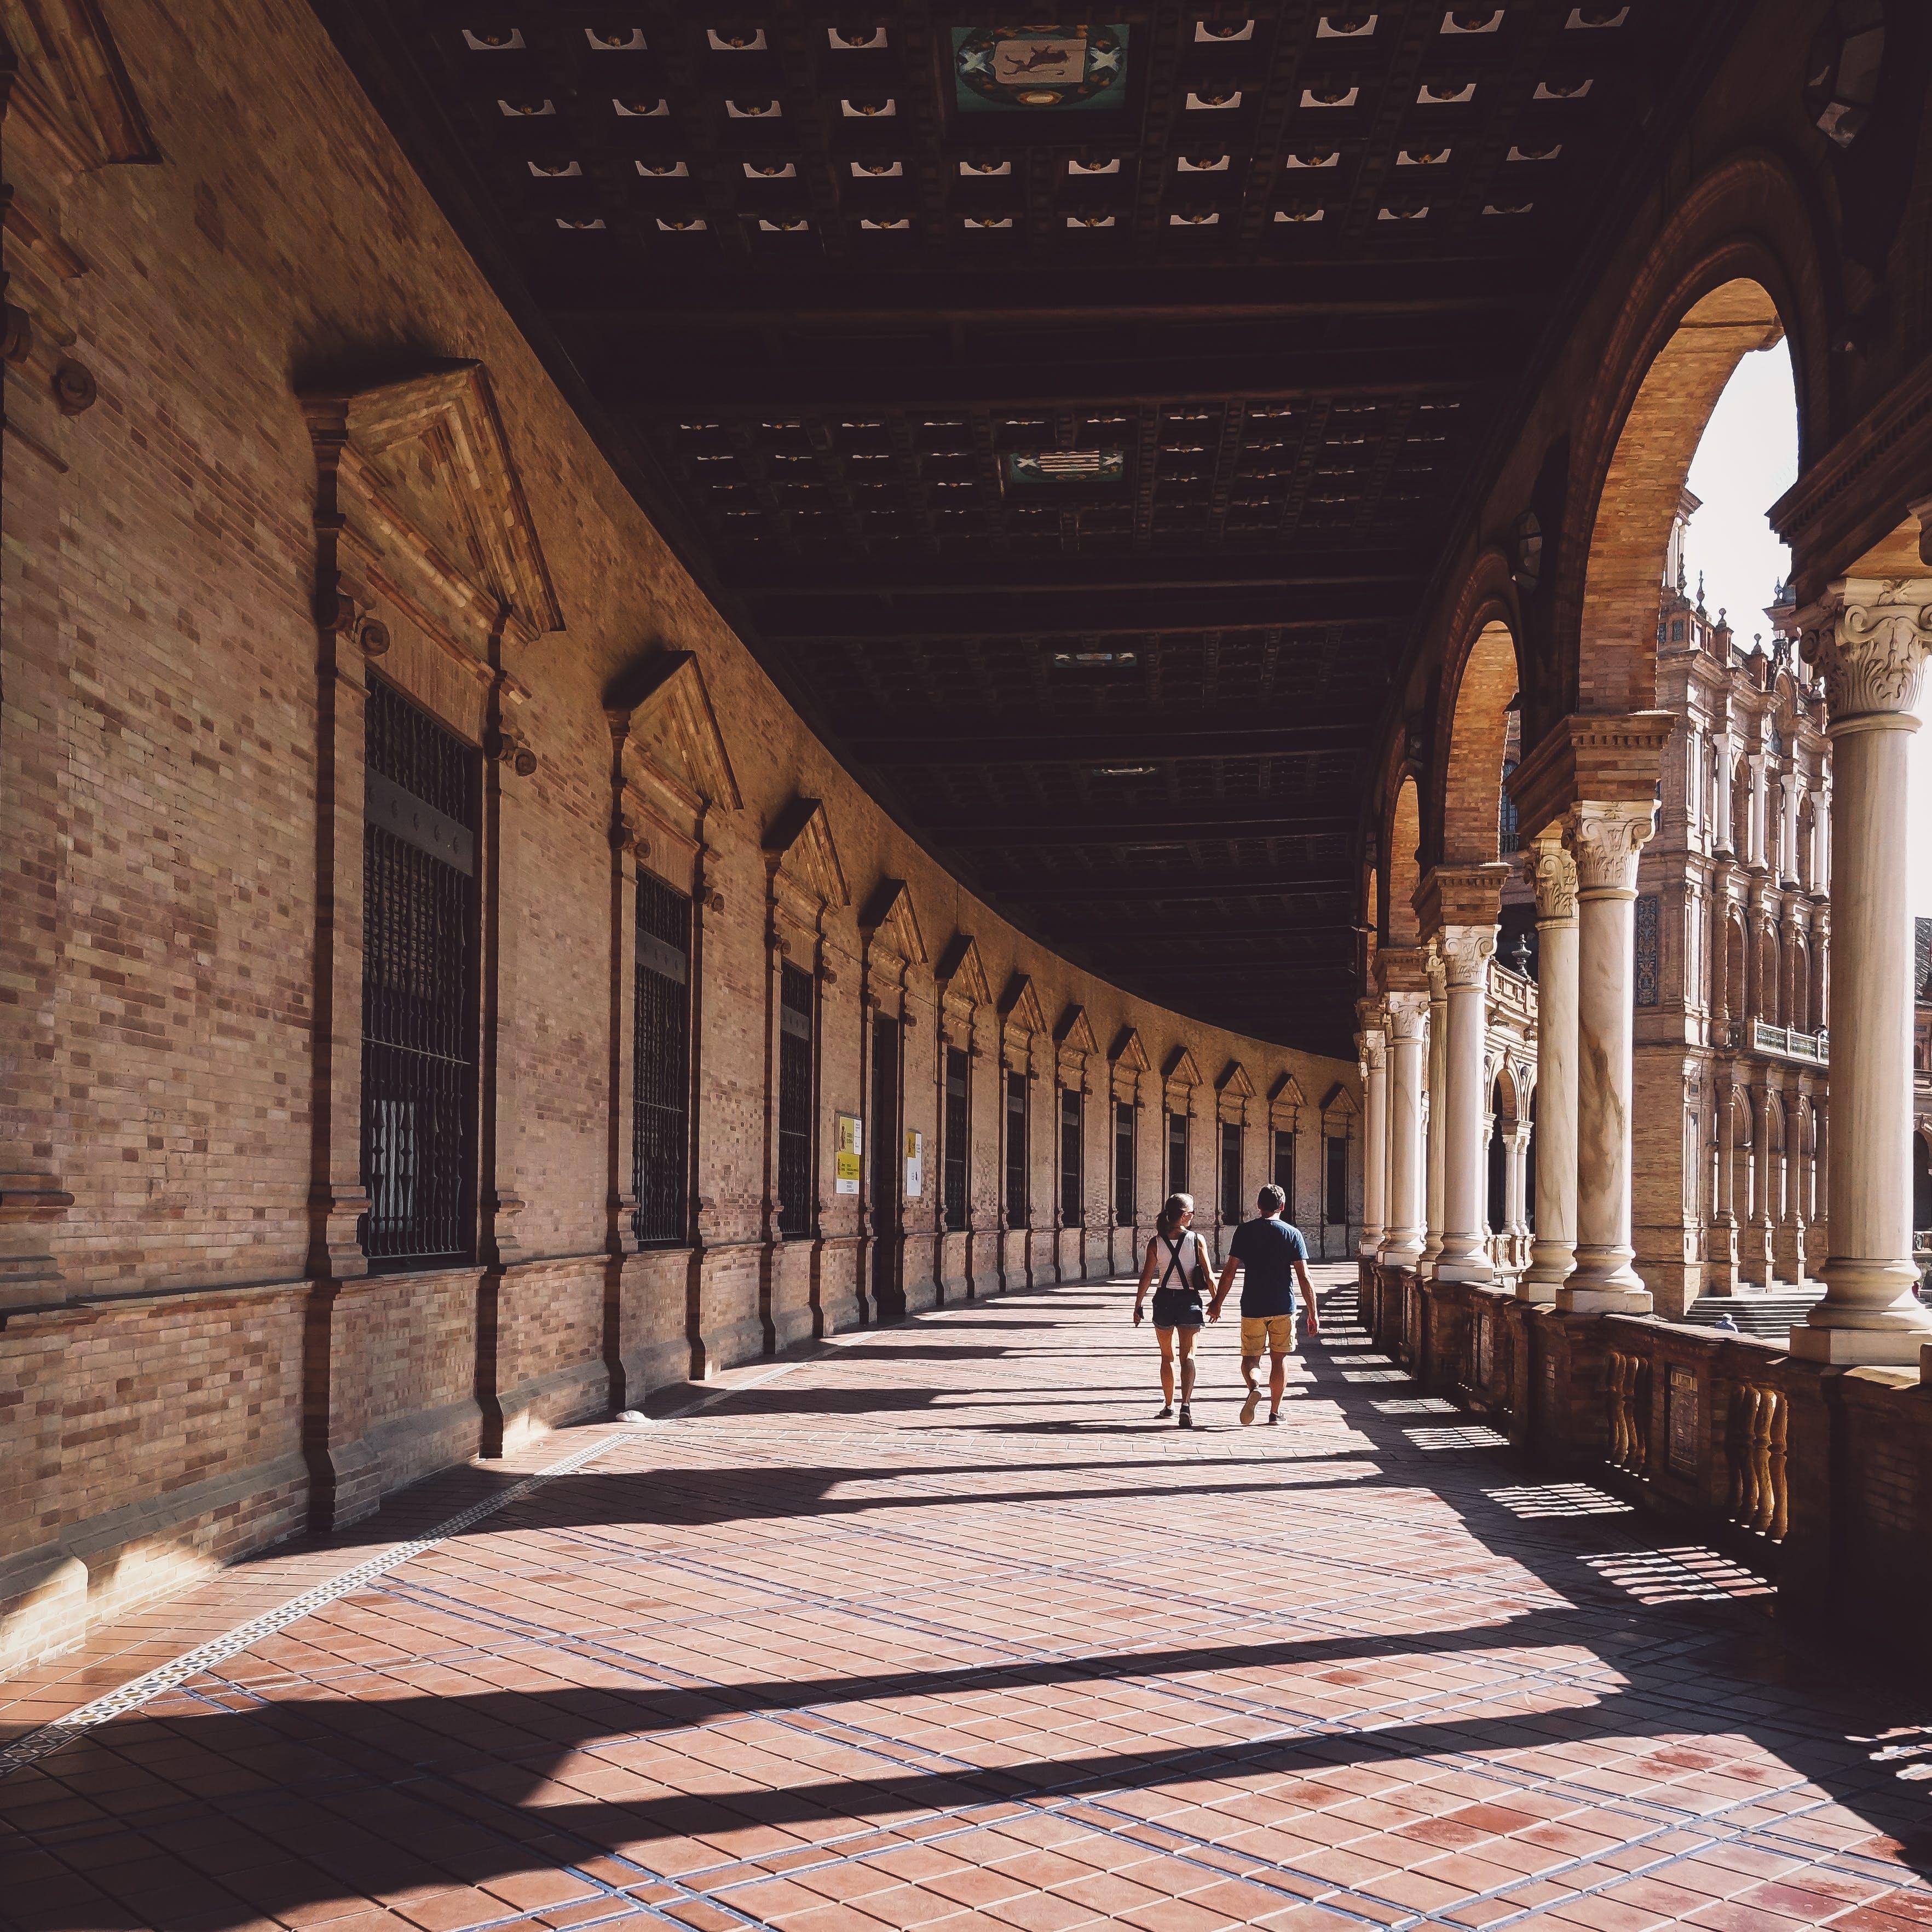 Man And Woman Walking On Hallway